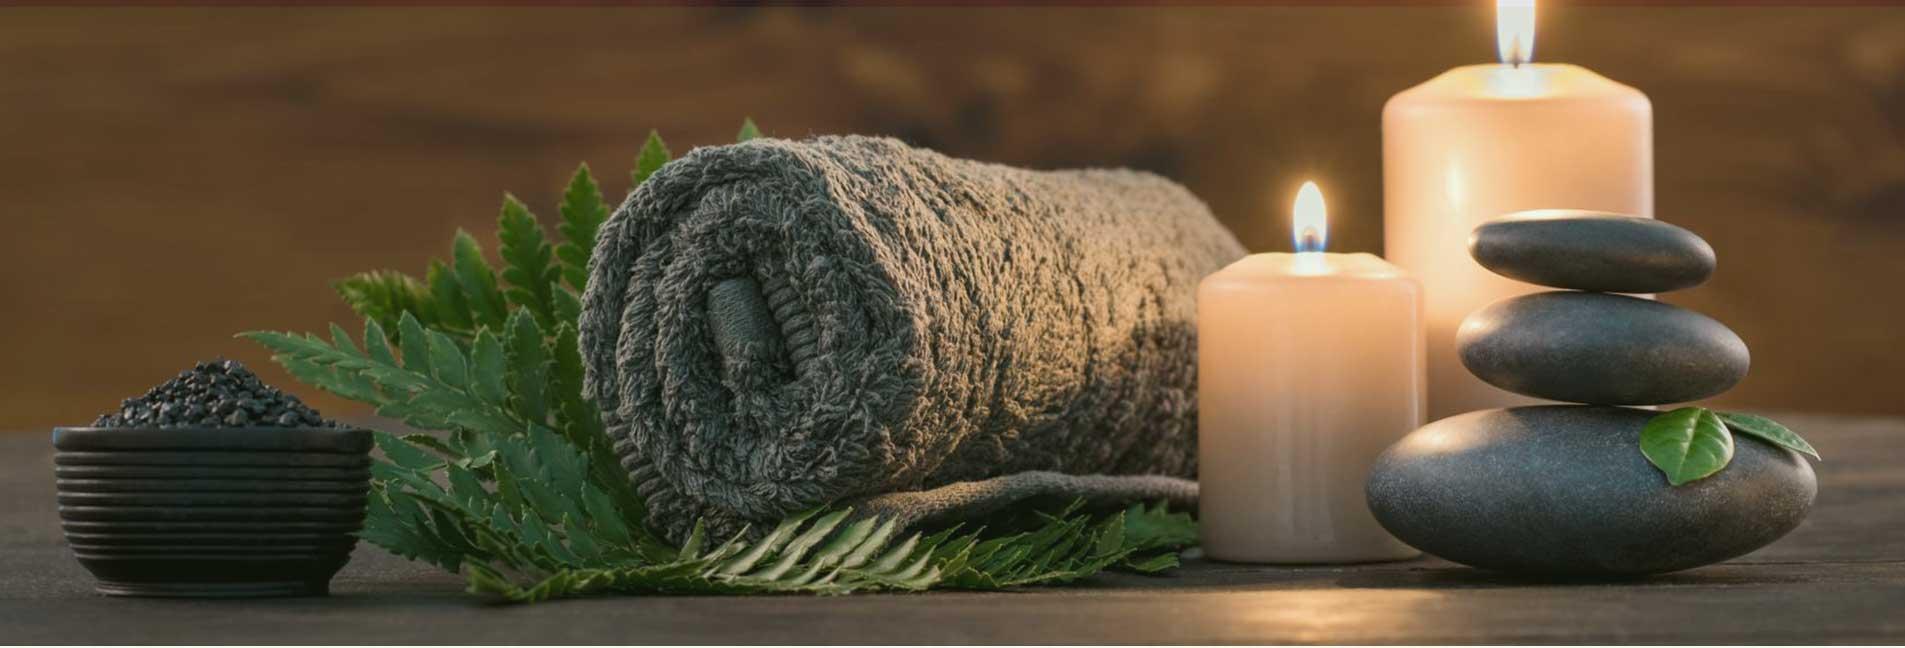 Honolulu Massage Anmeldelser - Top Rated Massage I Honolulu-3359